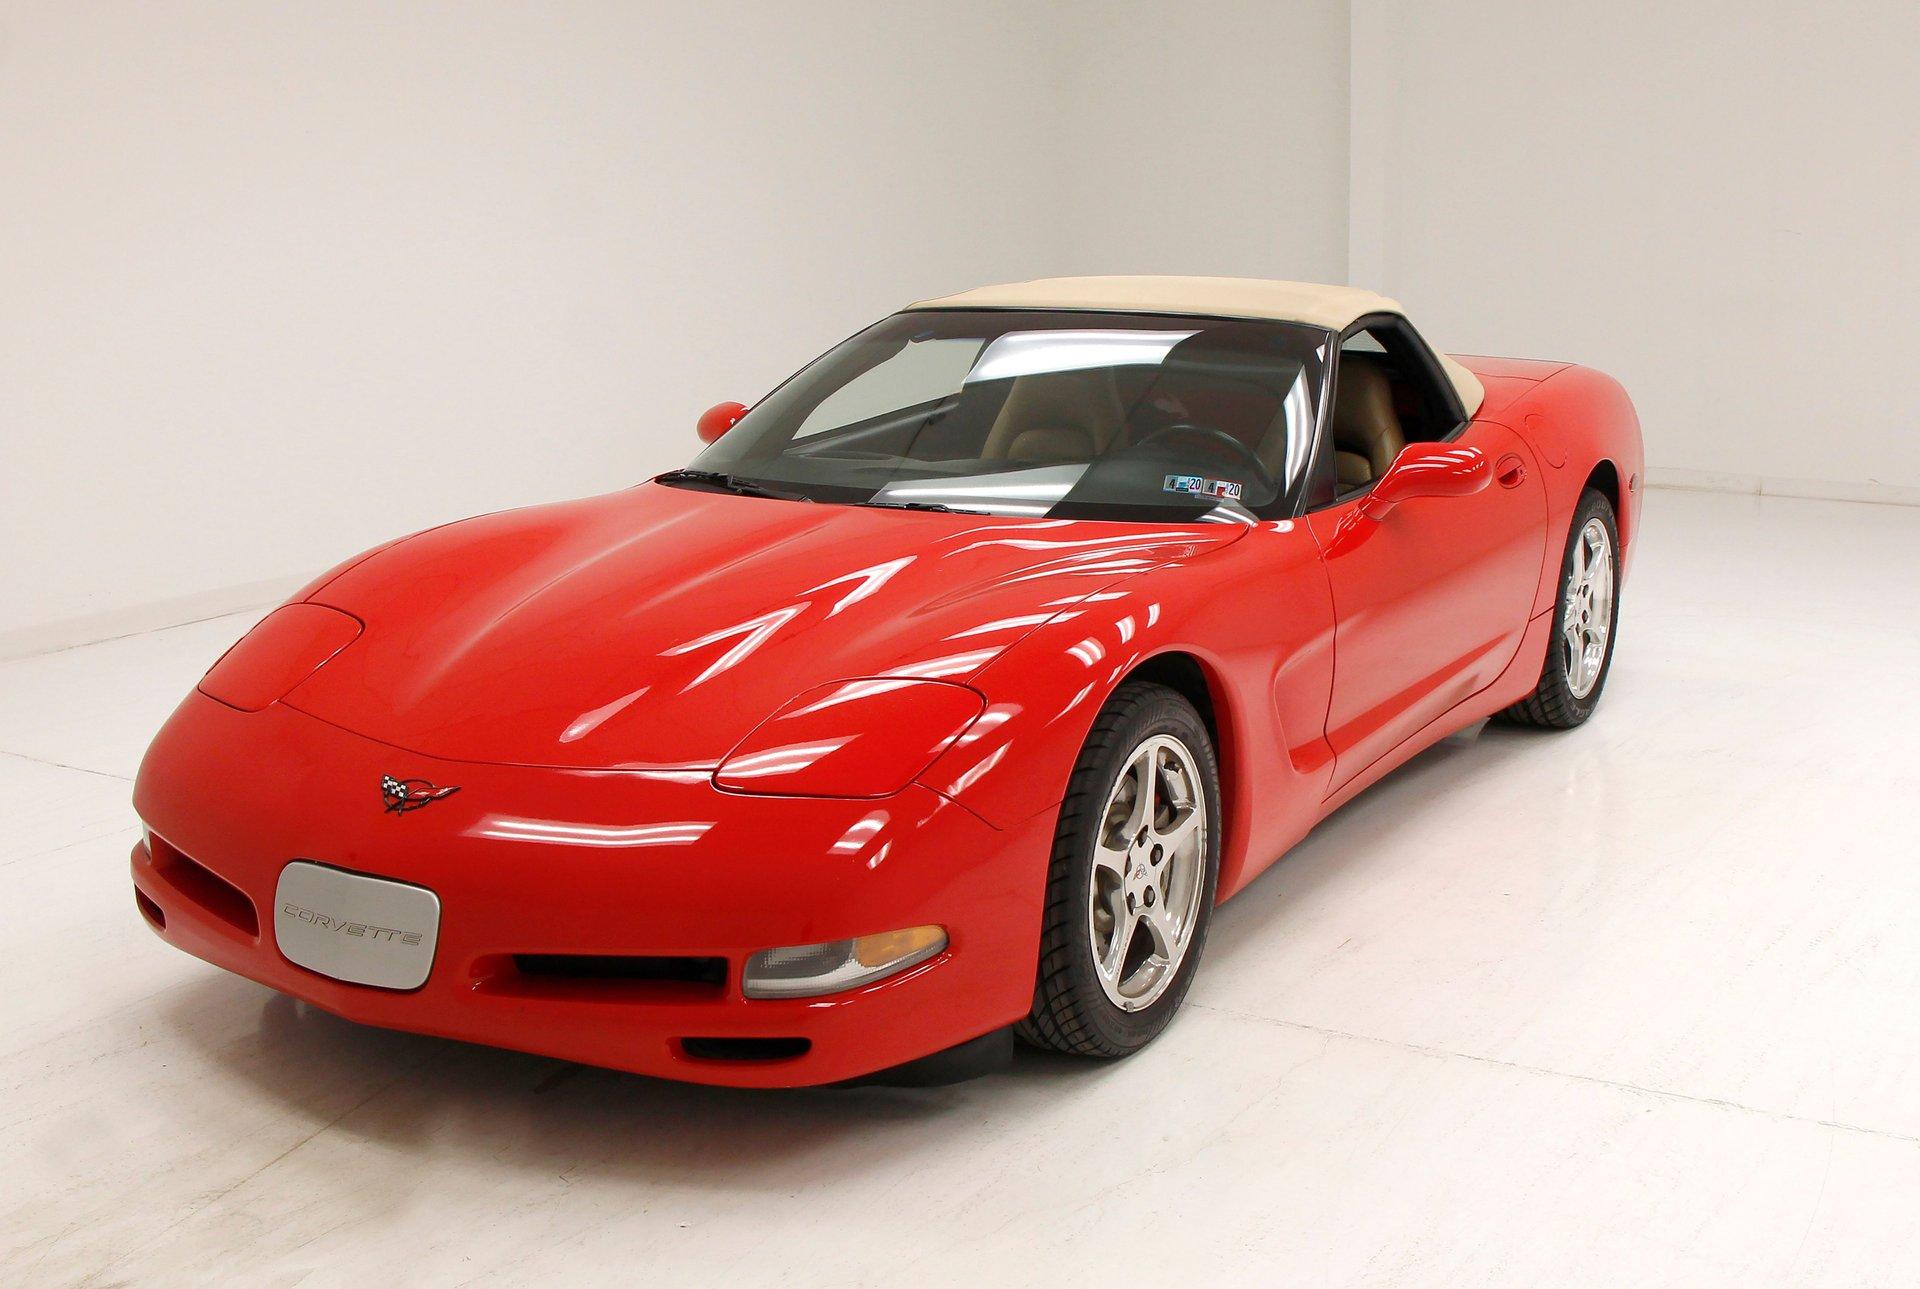 1999 Chevrolet Corvette Convertible